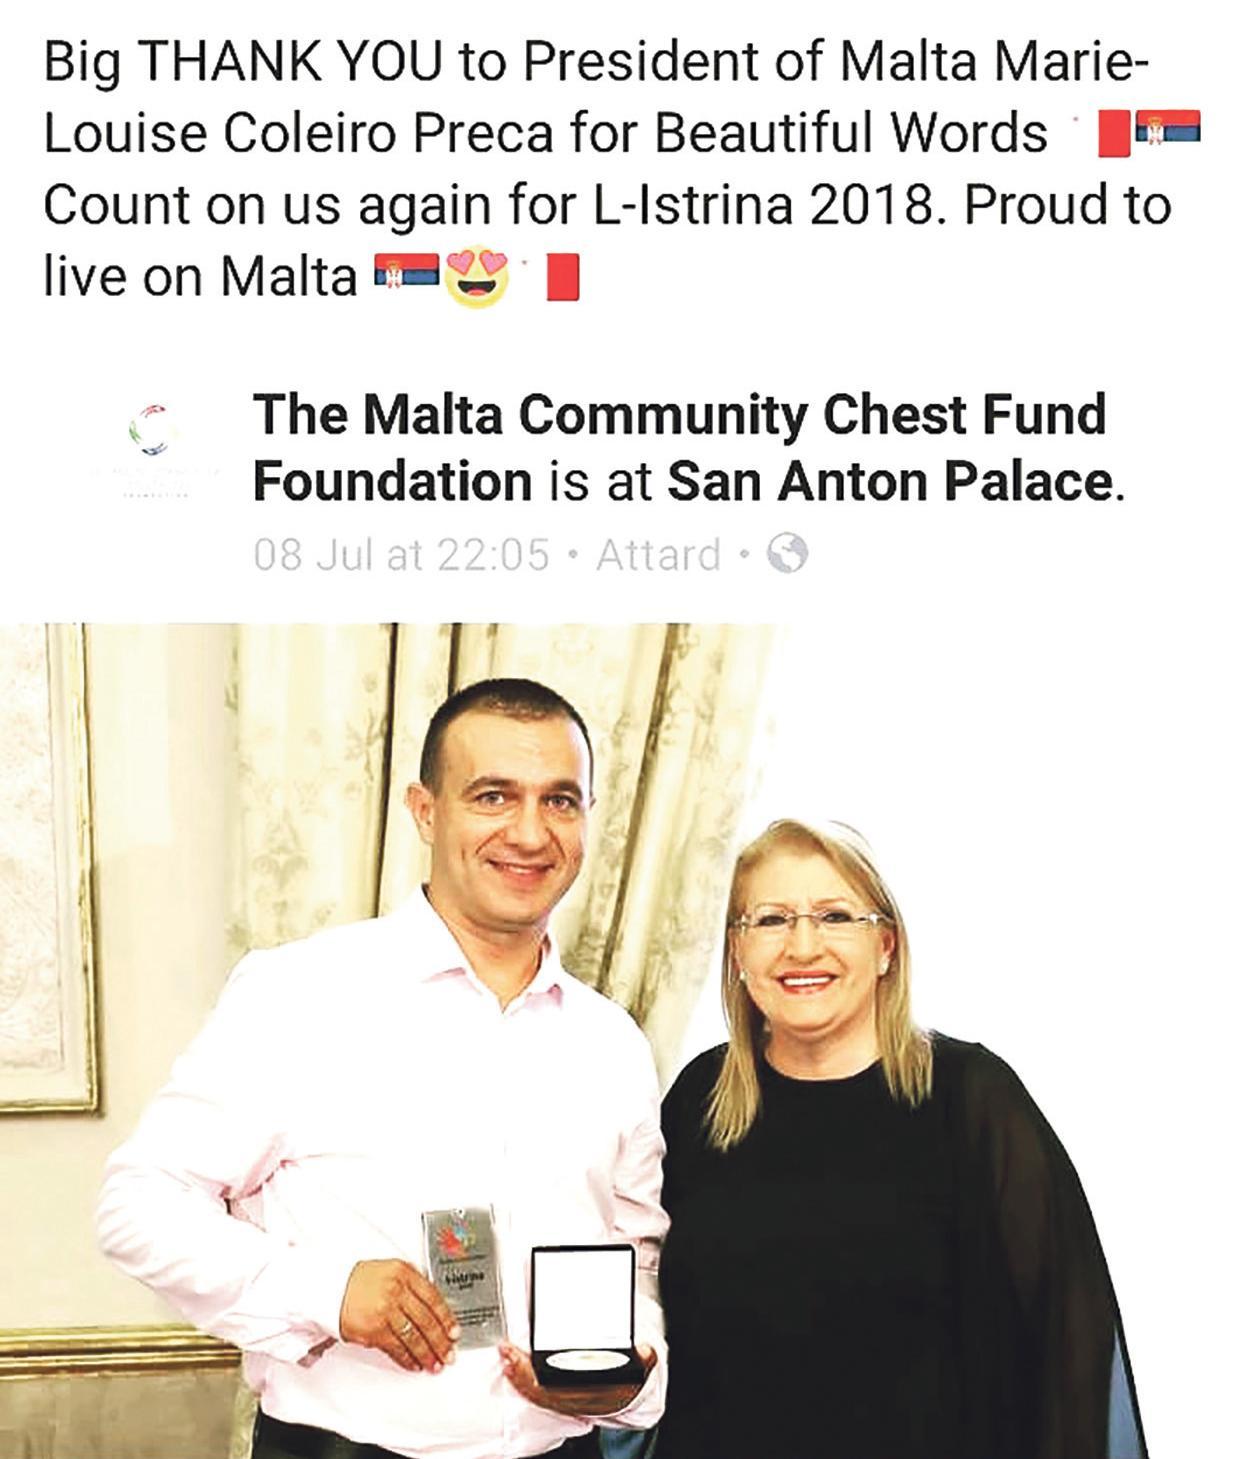 Serbian community figurehead Slobodan Rangelov with ex-President Marie-Louise Coleiro Preca donating €1,000 to l-istrina.